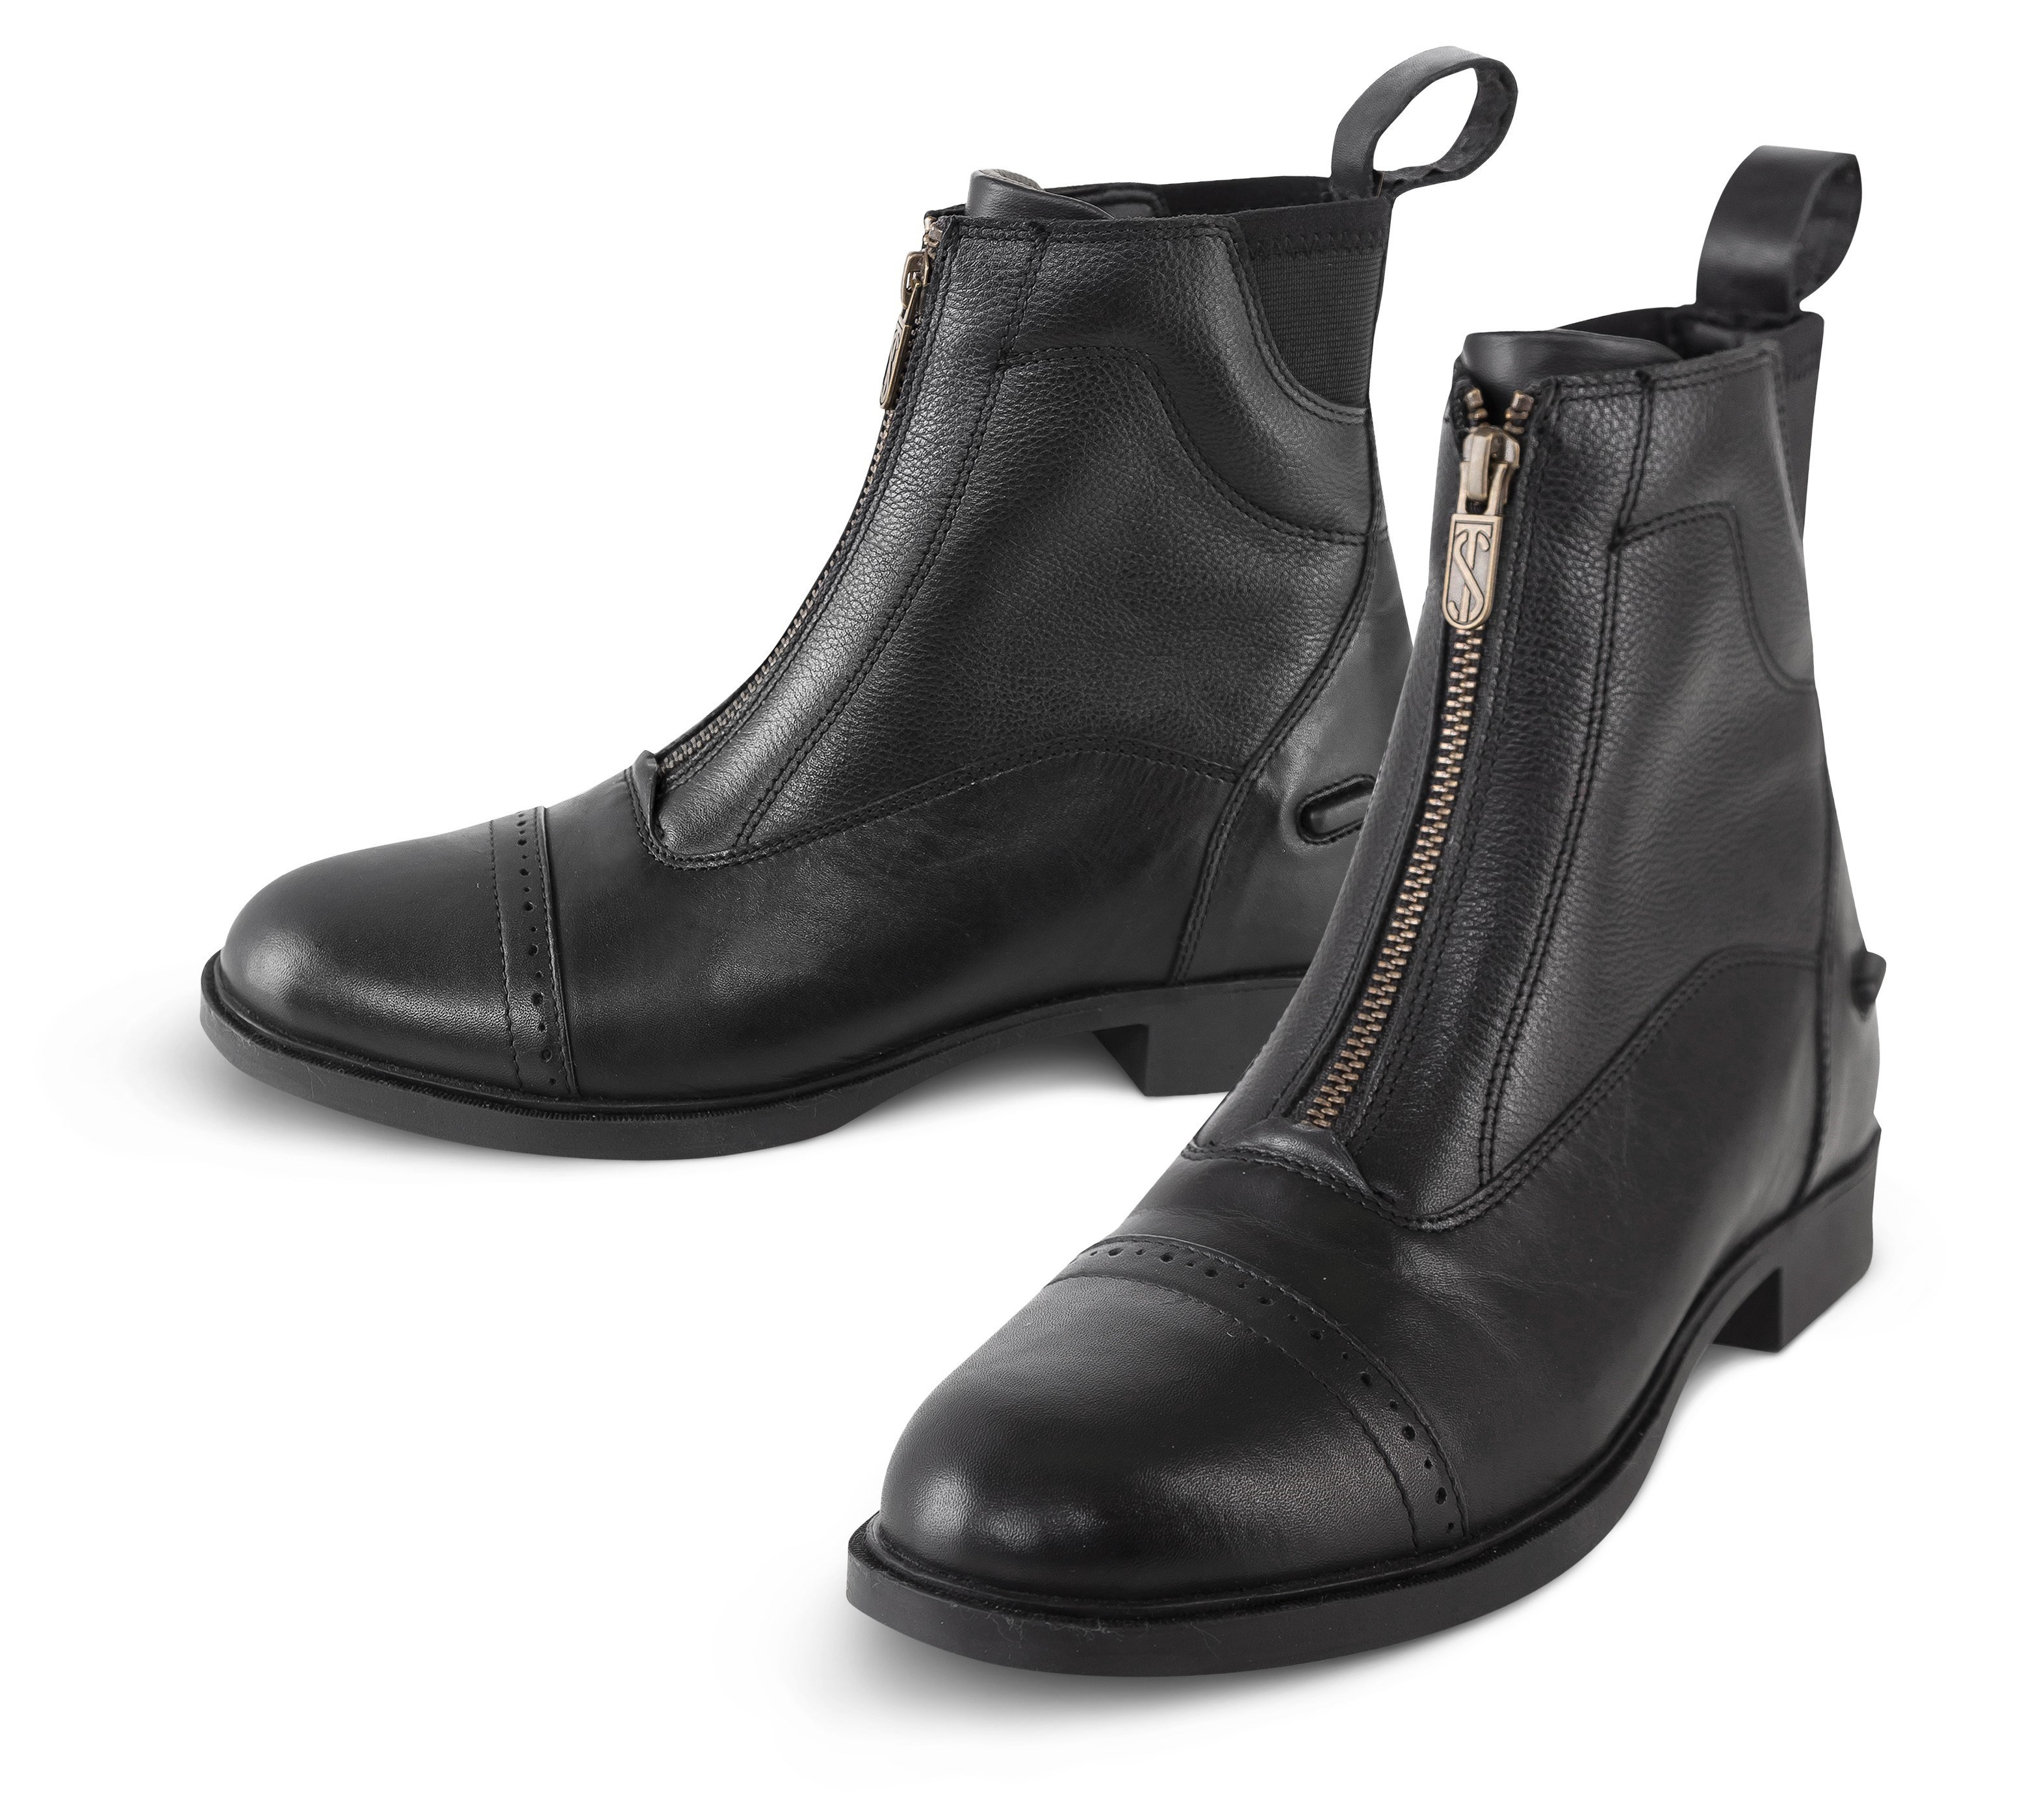 avant équitation Boots cuir Tredstep Giotto II zip kwXlOuZTPi